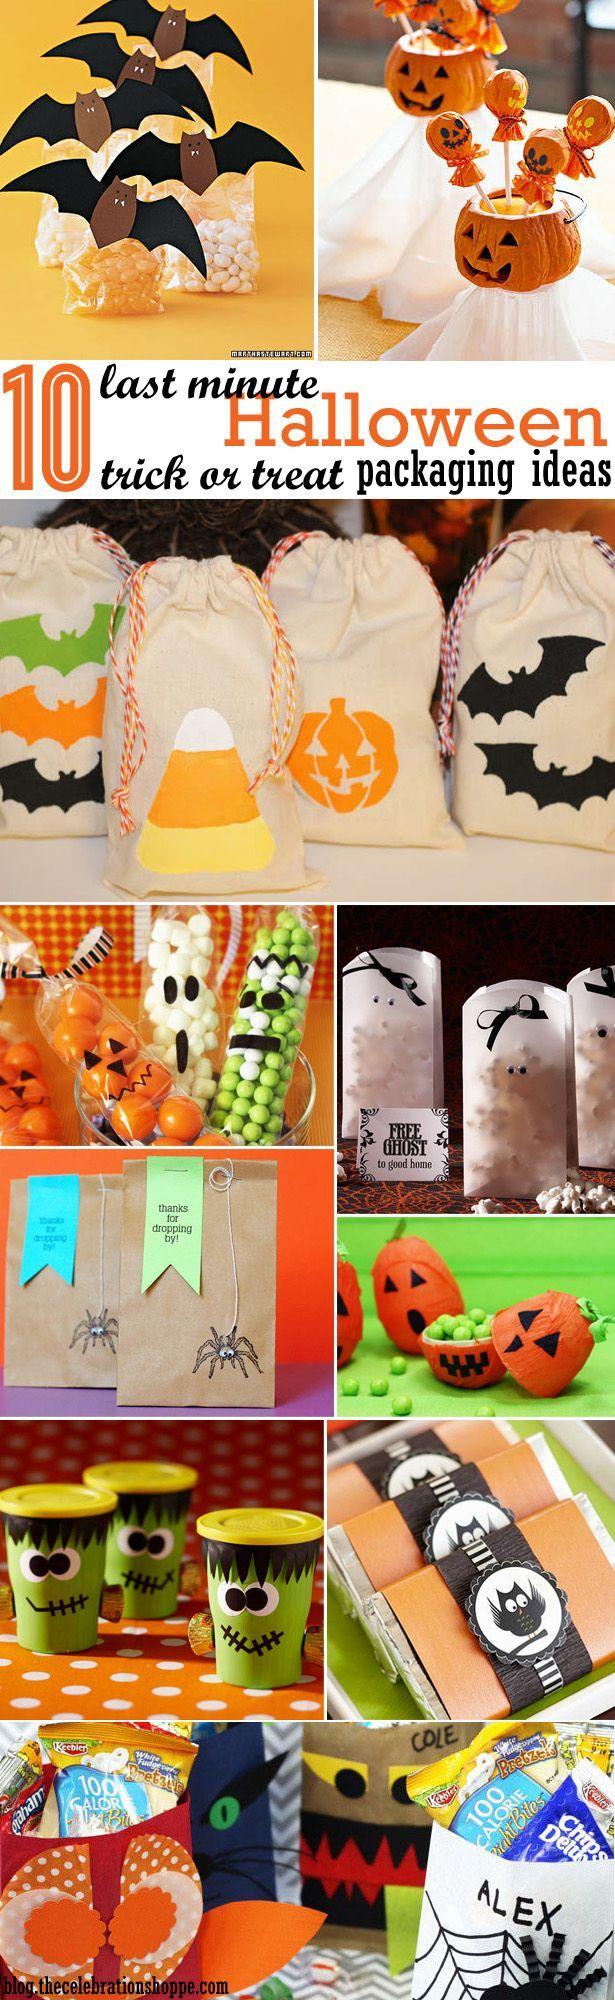 10 last minute trick or treat packaging ideas - Halloween Trick Ideas